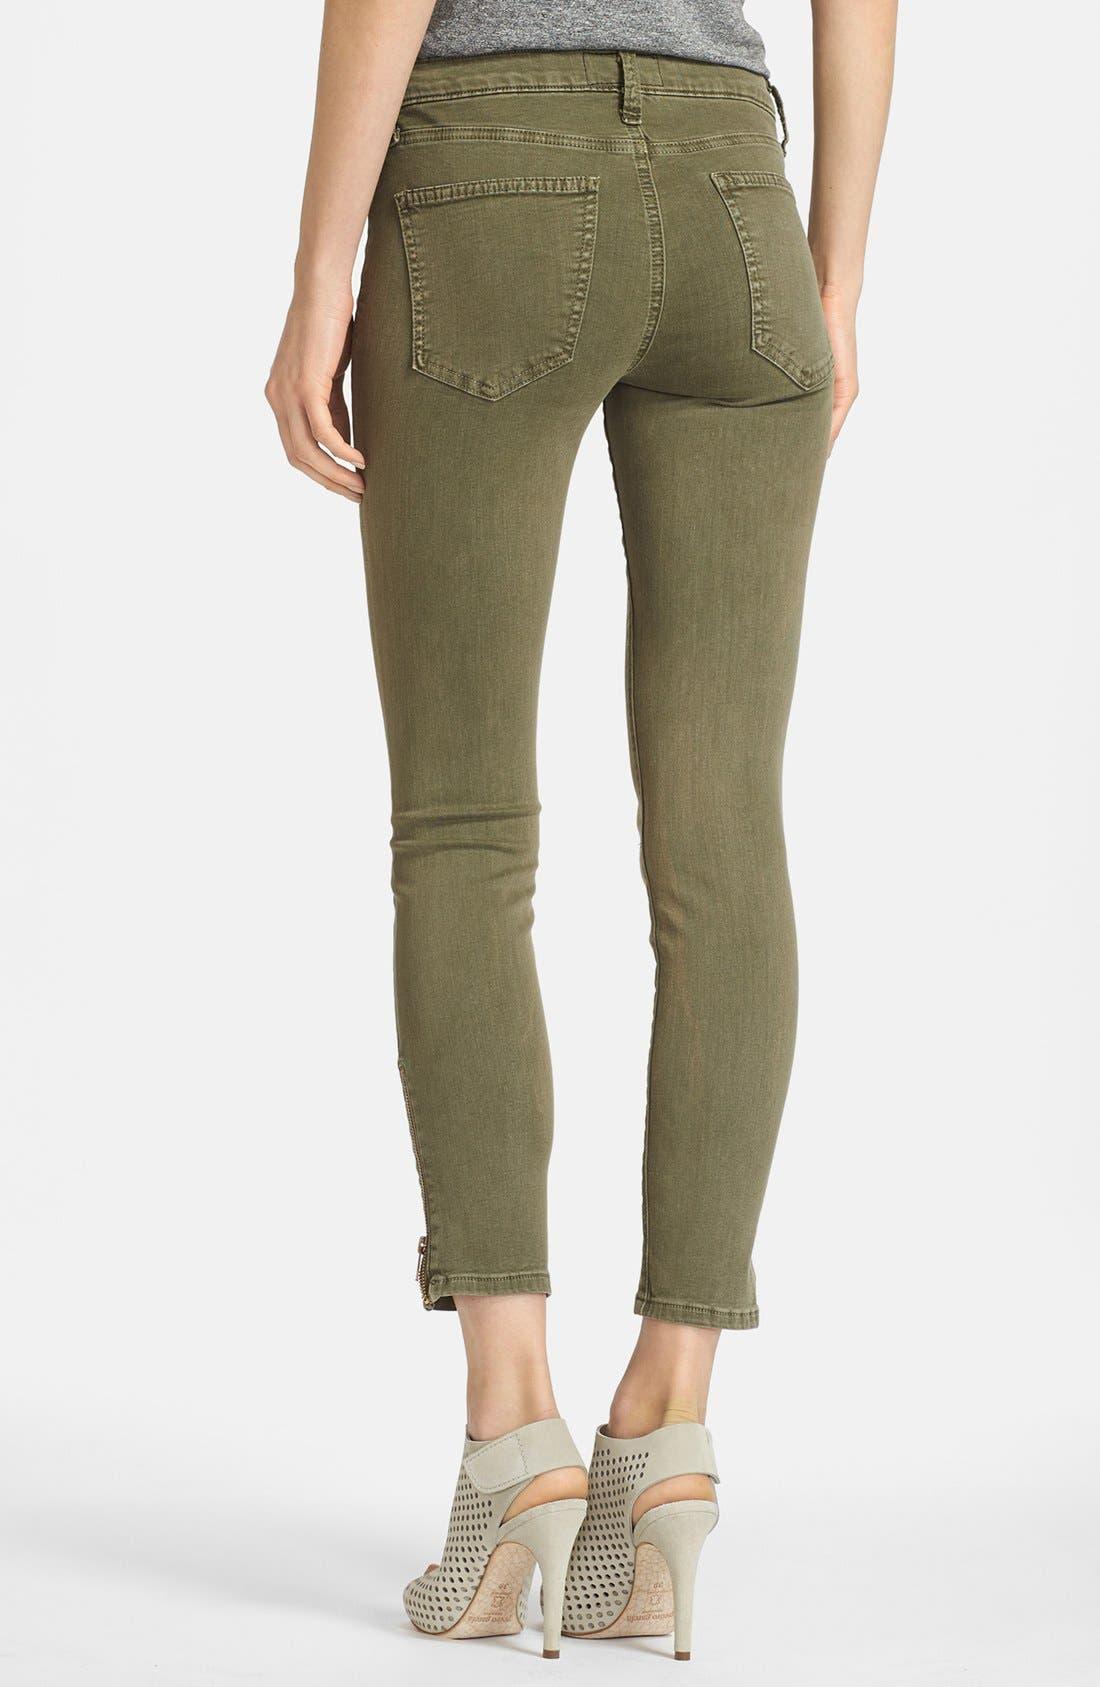 Alternate Image 2  - Current/Elliott 'The Soho Zip Stiletto' Skinny Jeans (Army)